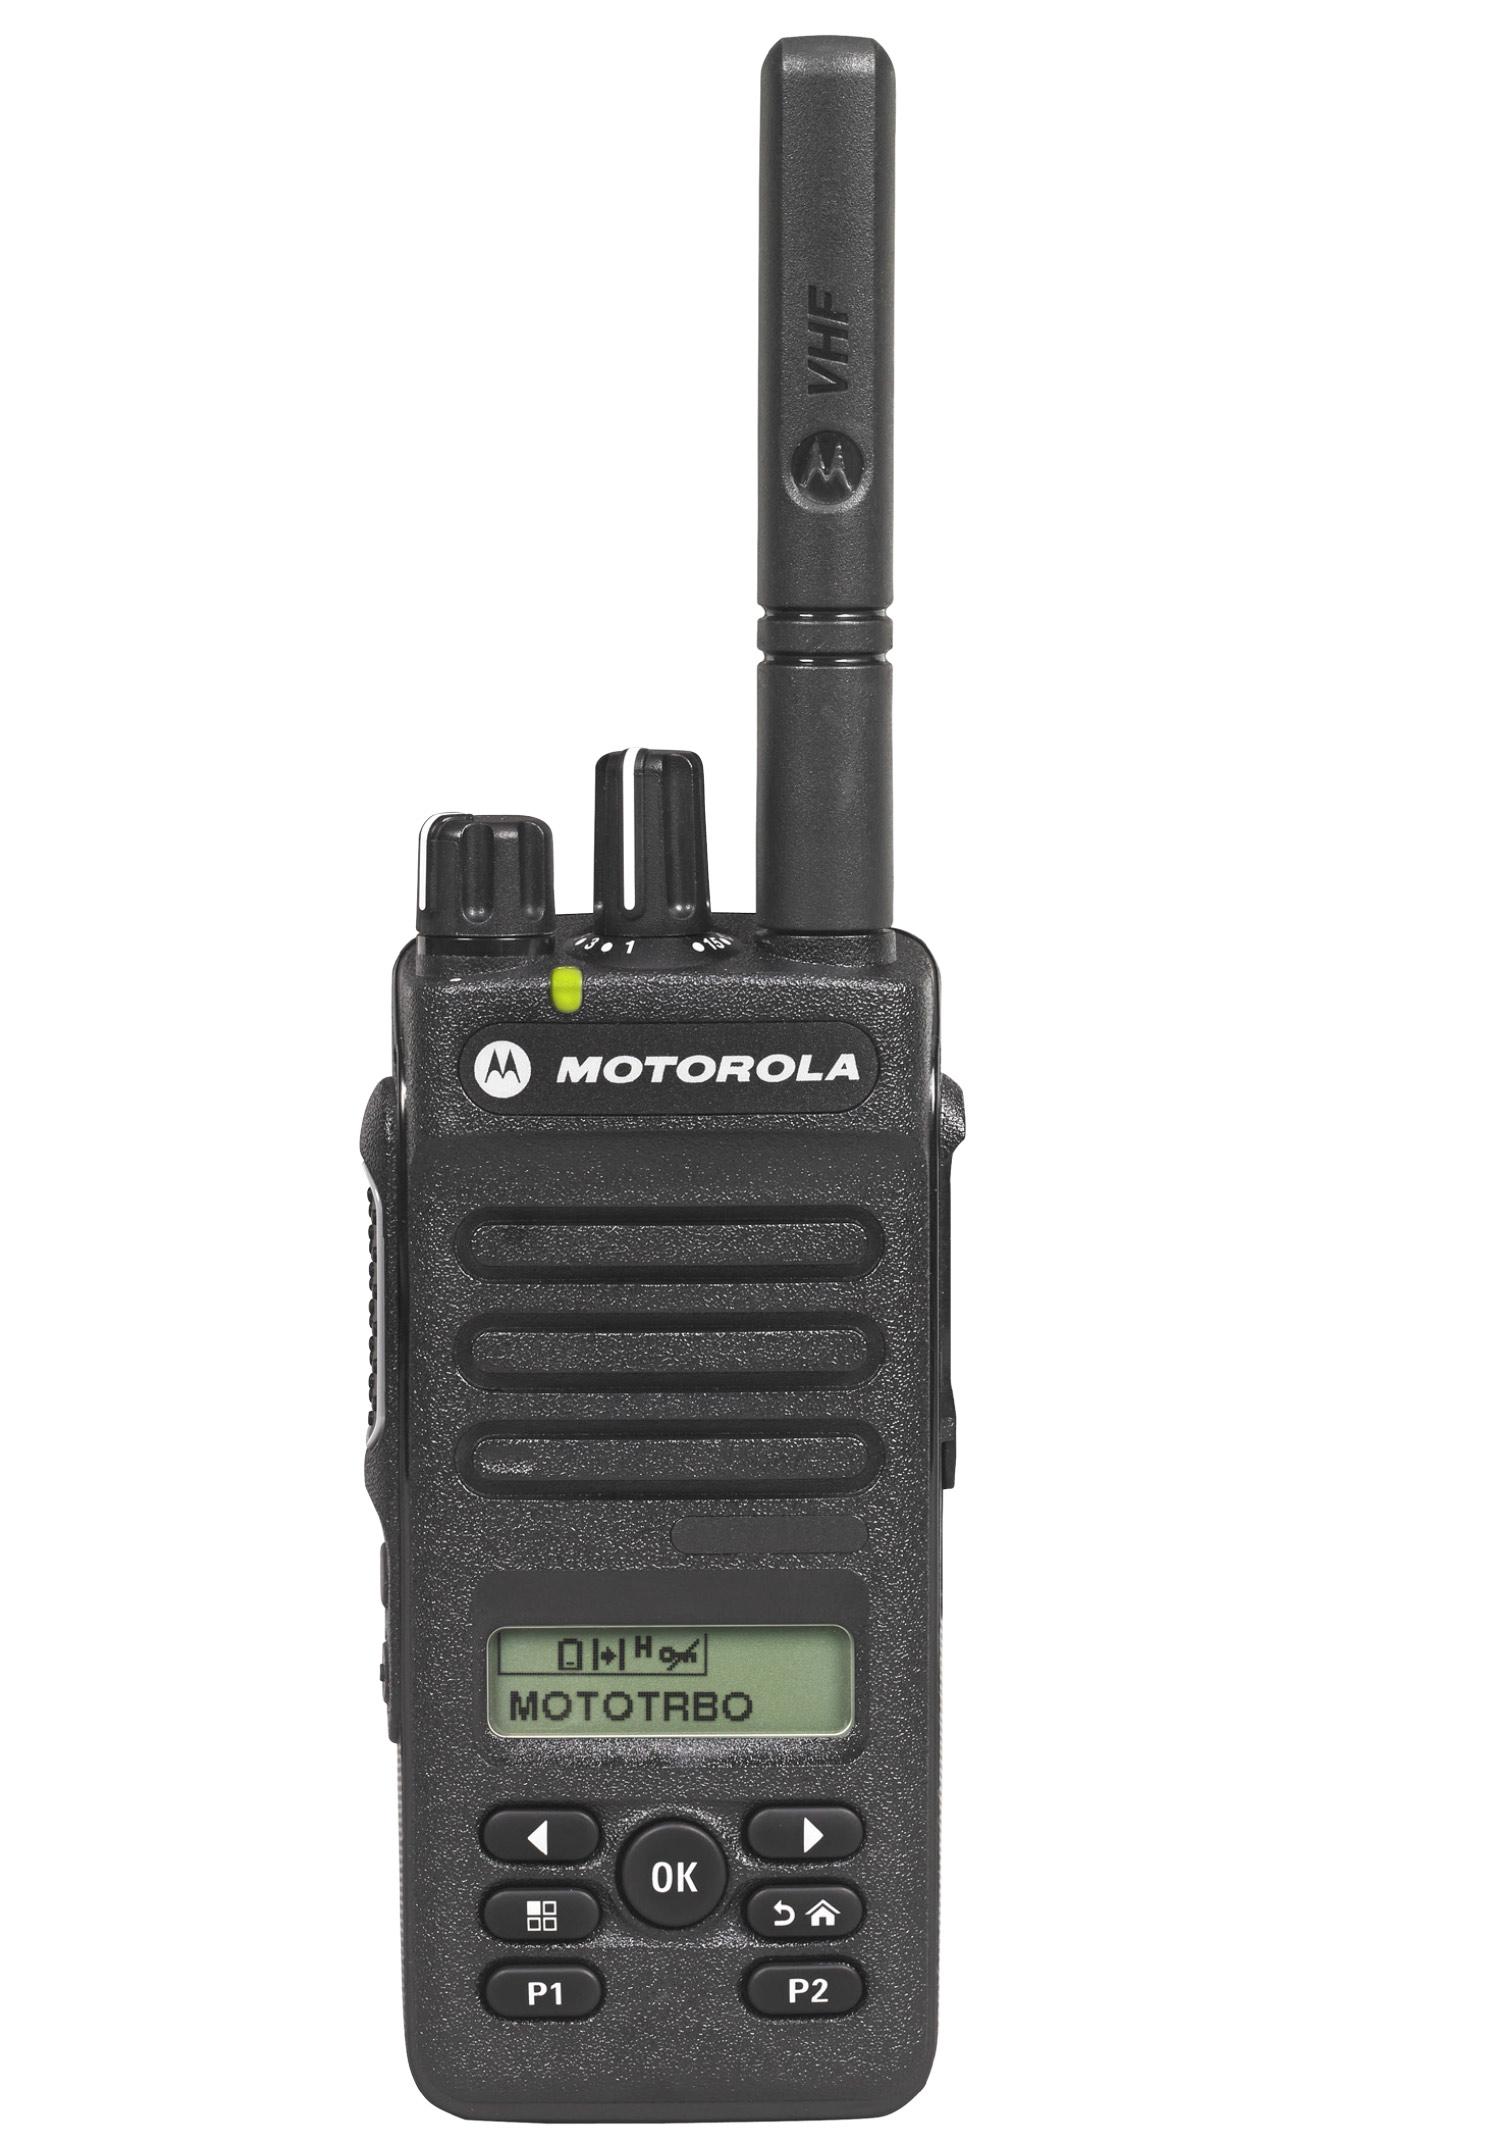 professional radio suppliers in uae